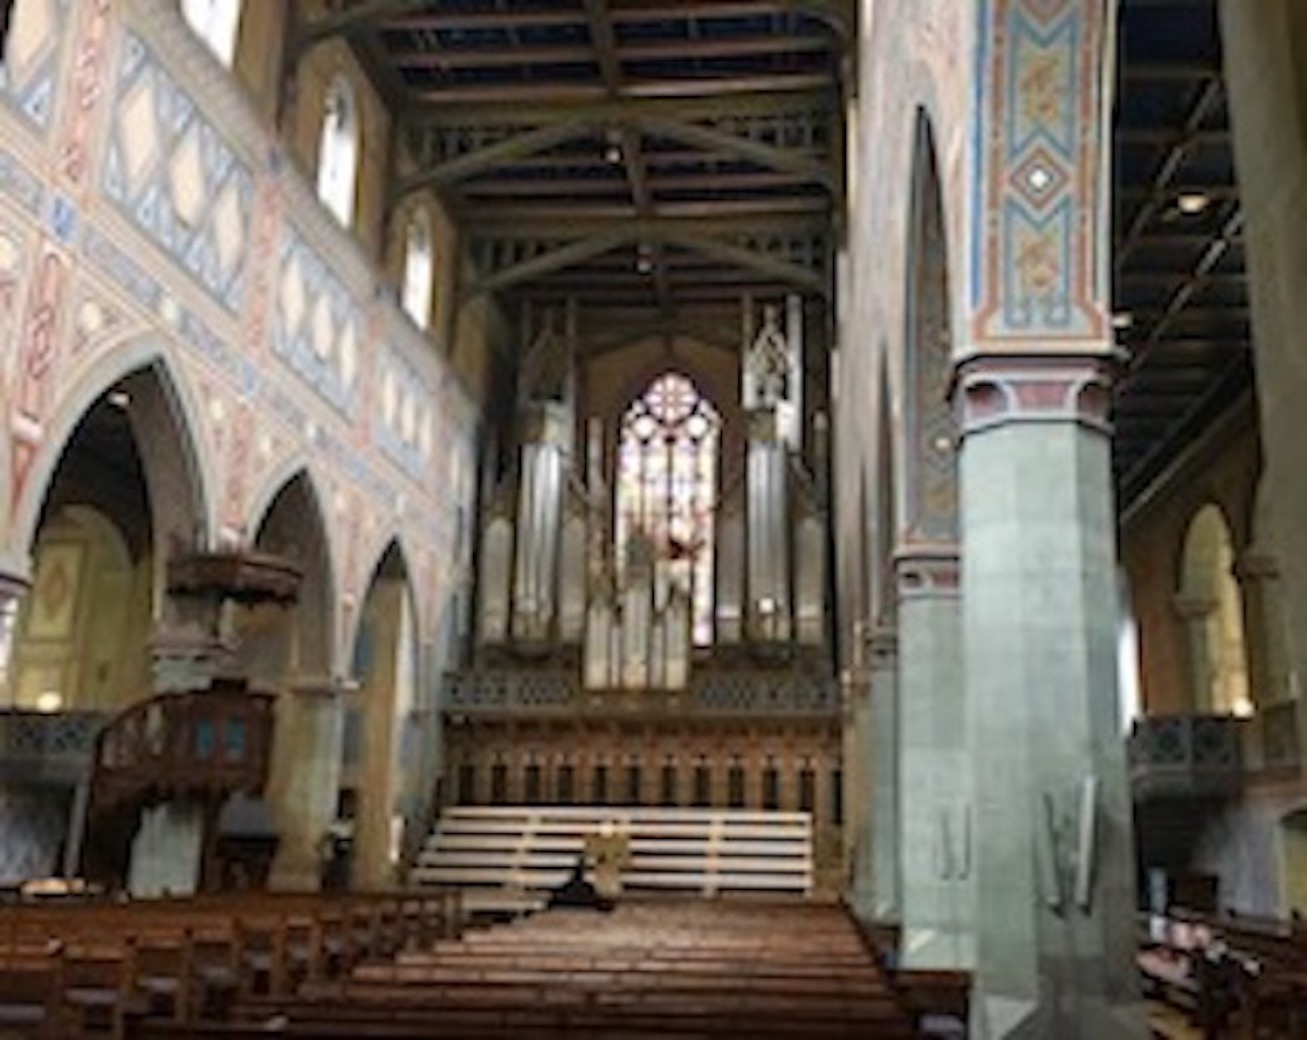 Kirche St.Laurenzen St.Gallen Schweiz Innenraum